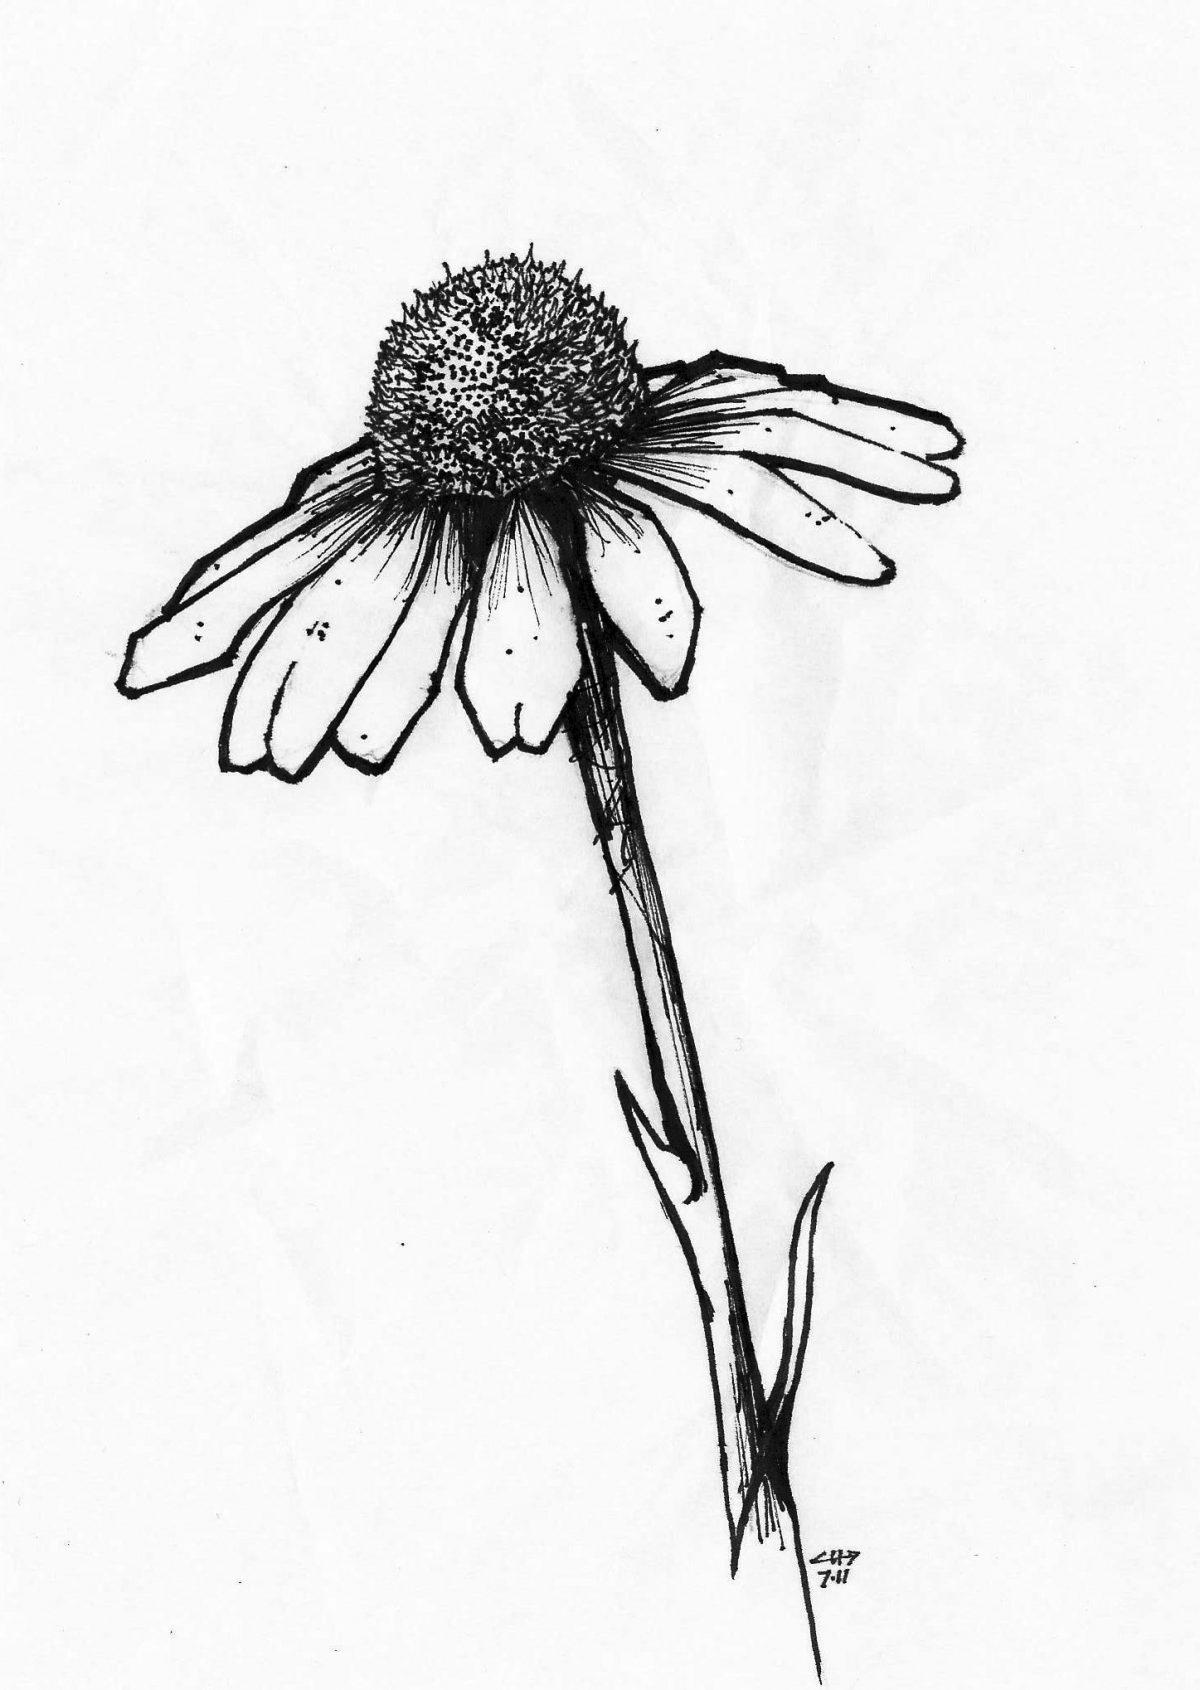 Flower - Pen on paper, 13x18cm, paper, illustration, ch3